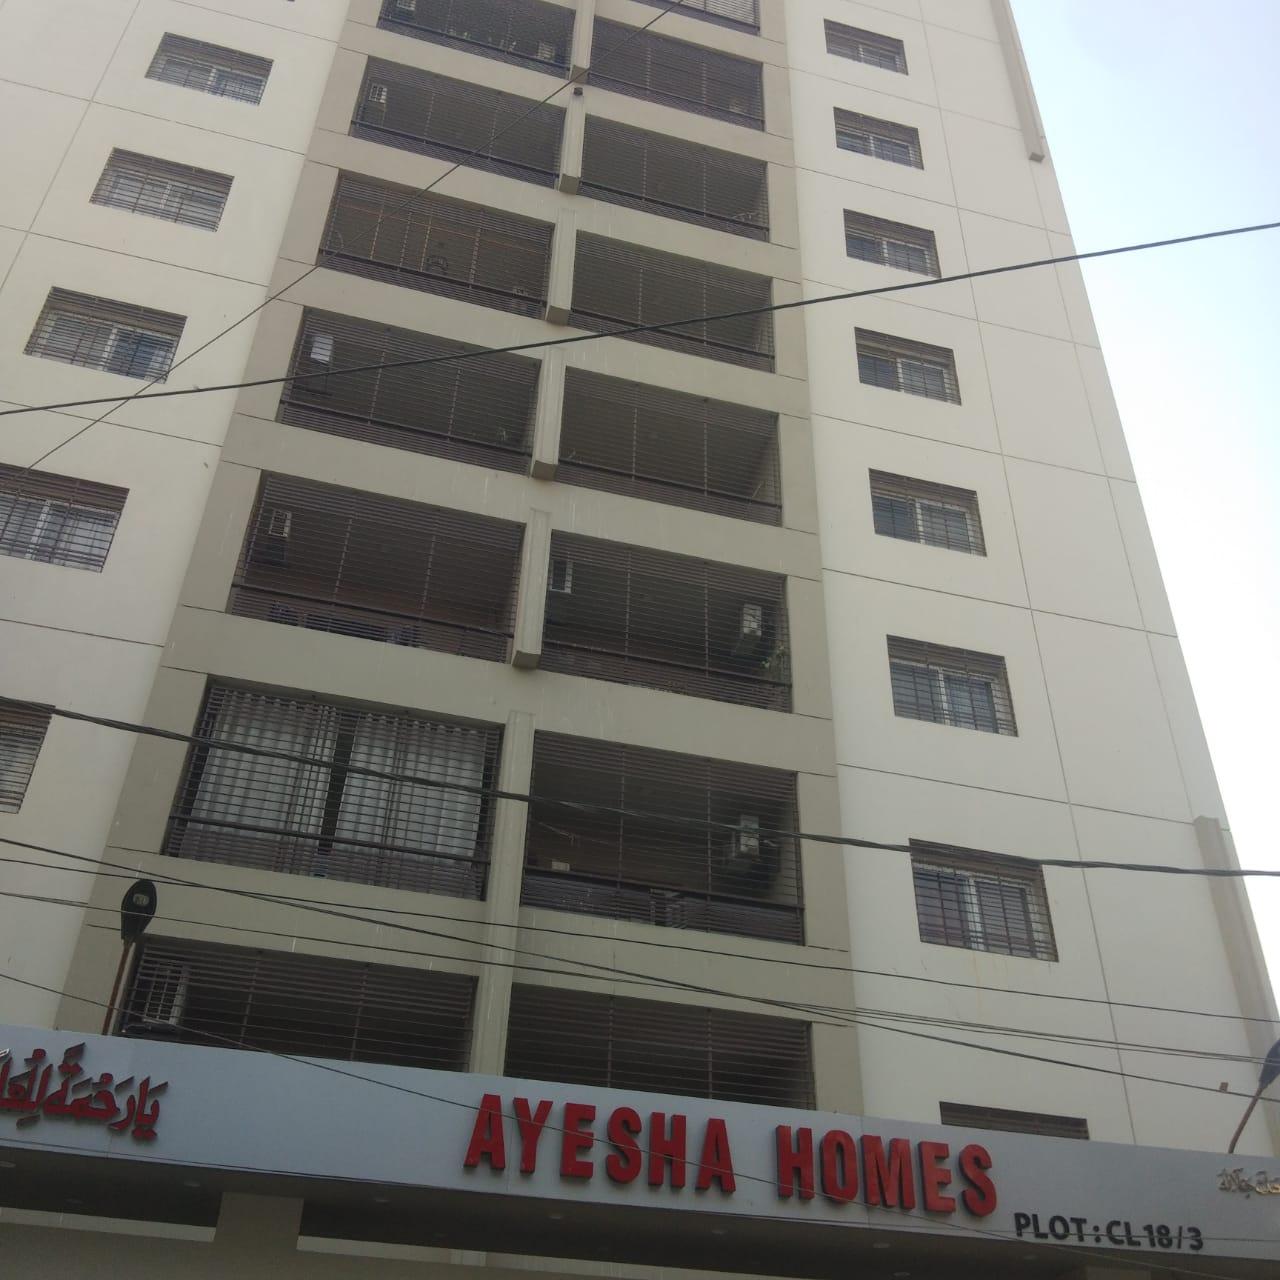 Ayesha Homes Buy Sell Property In Karachi Property Dealer In Karachi Clifton Clifton Property Dealer In Karachi Defence Clifton Property Dealer In Karachi